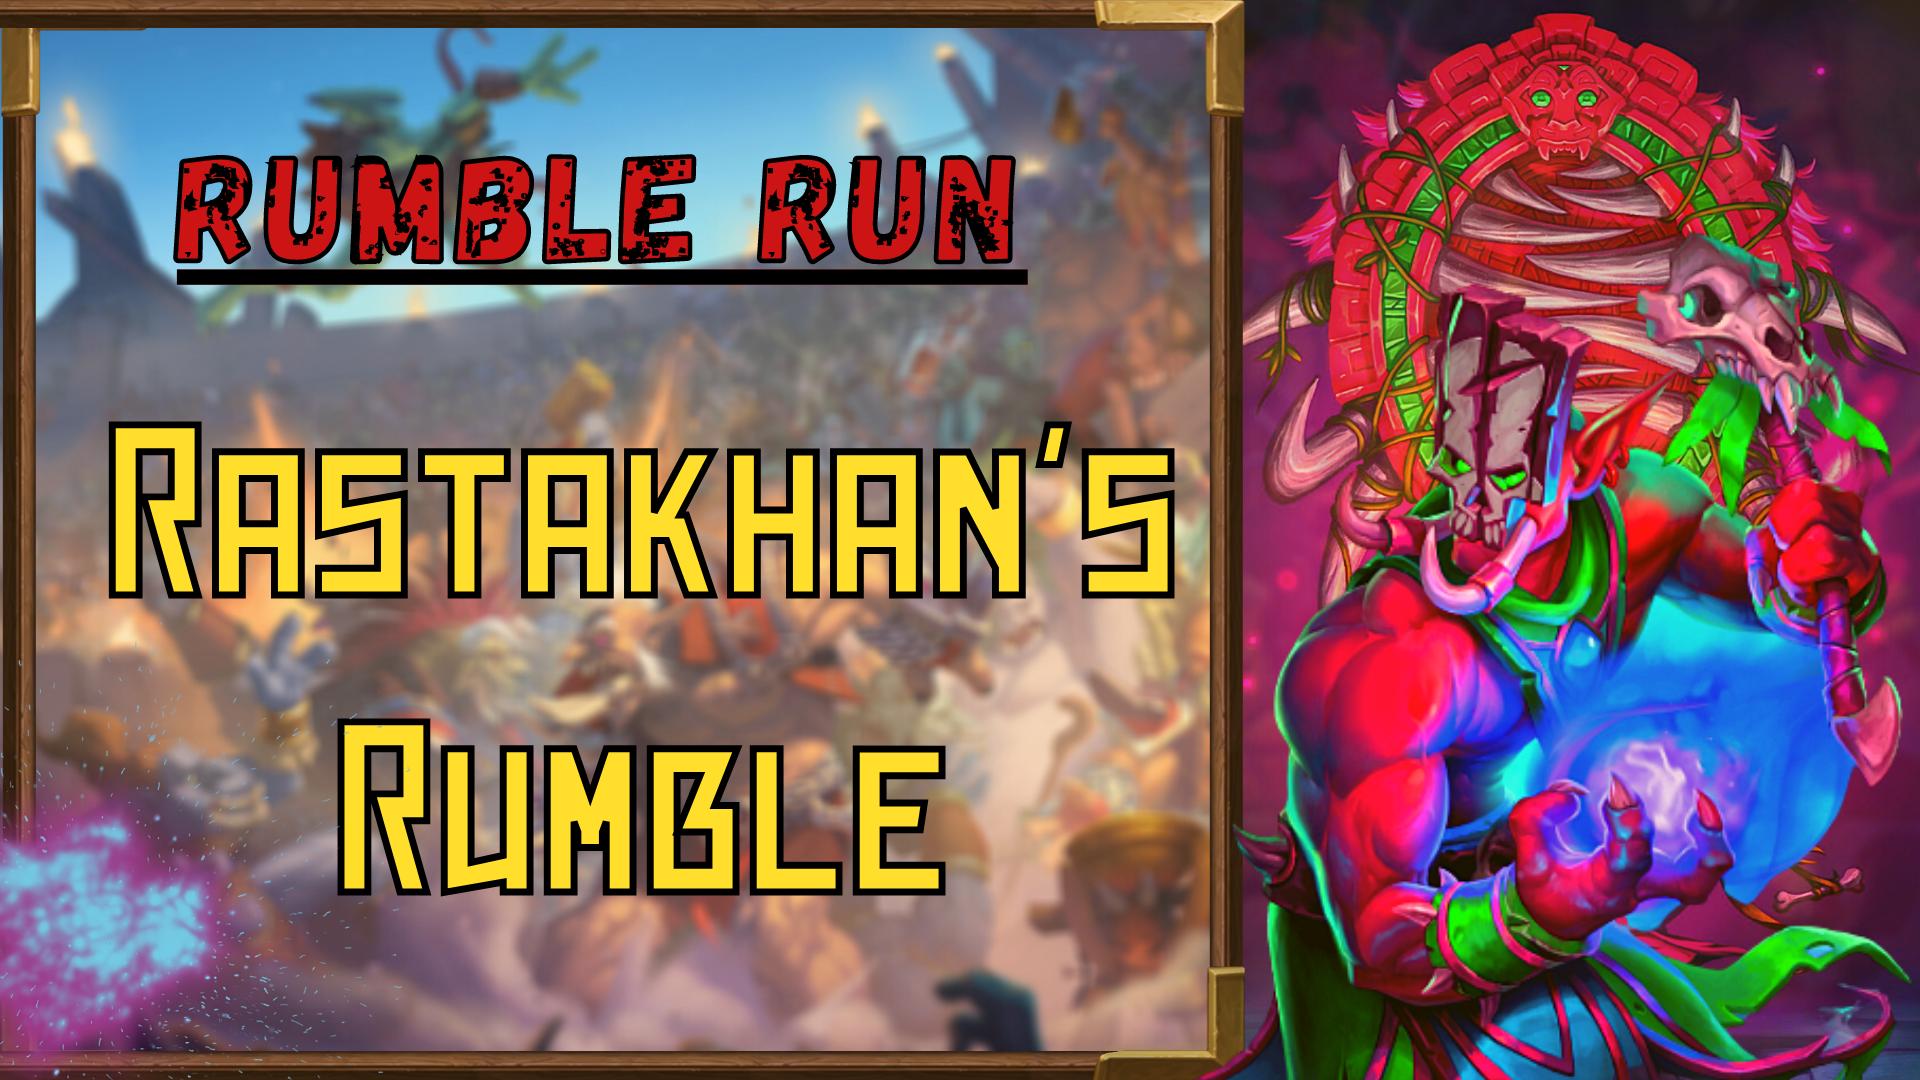 Rumble run: Rastakhan's Rumble GBD - e2p.com